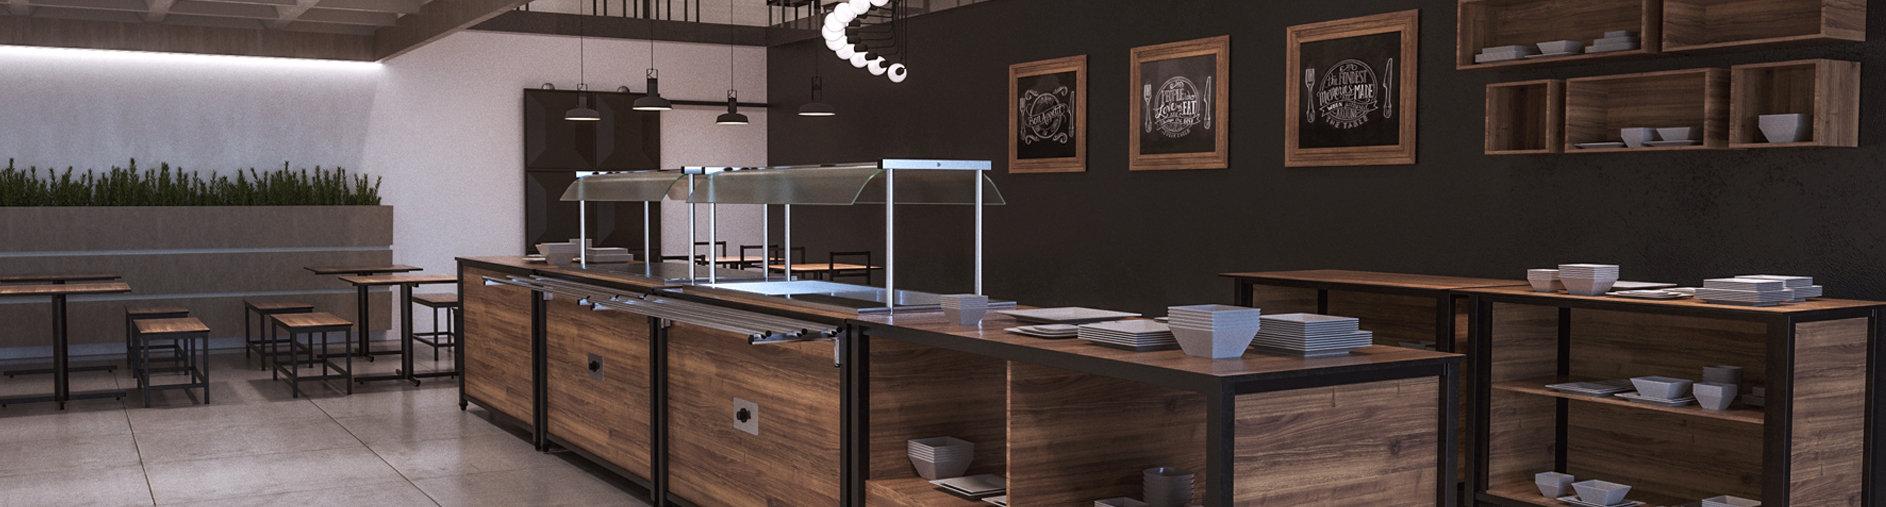 Testeira Restaurante- Estilo Industrial.